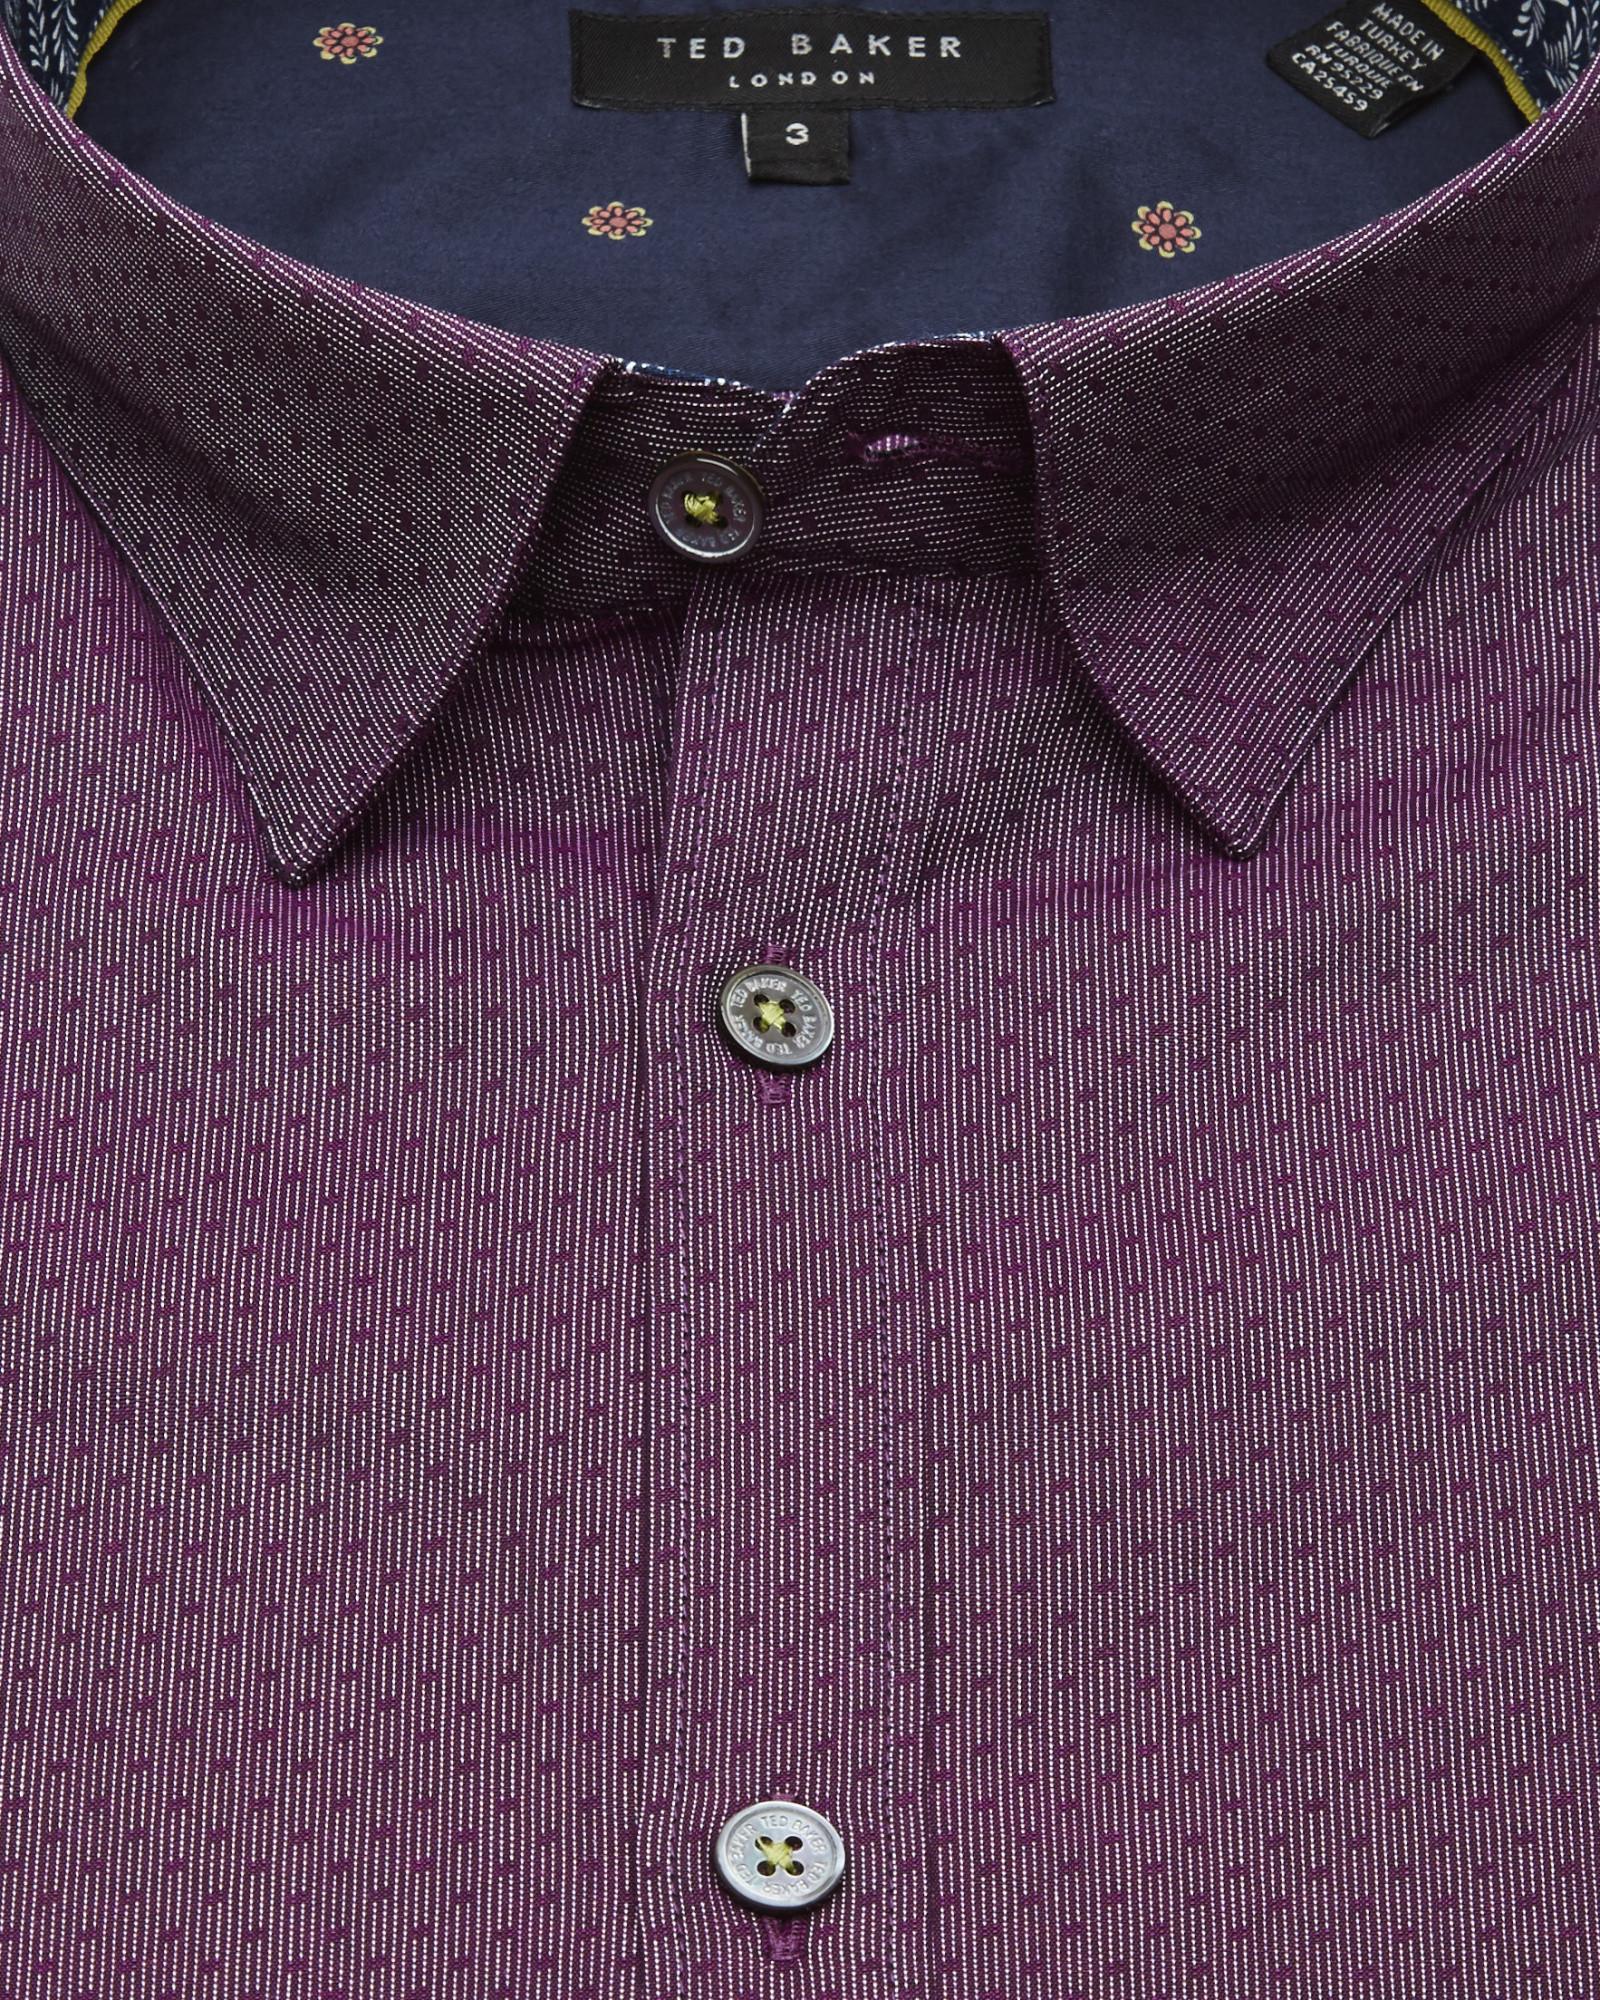 00a6cb327 Lyst - Ted Baker Pindot Dobby Shirt in Purple for Men